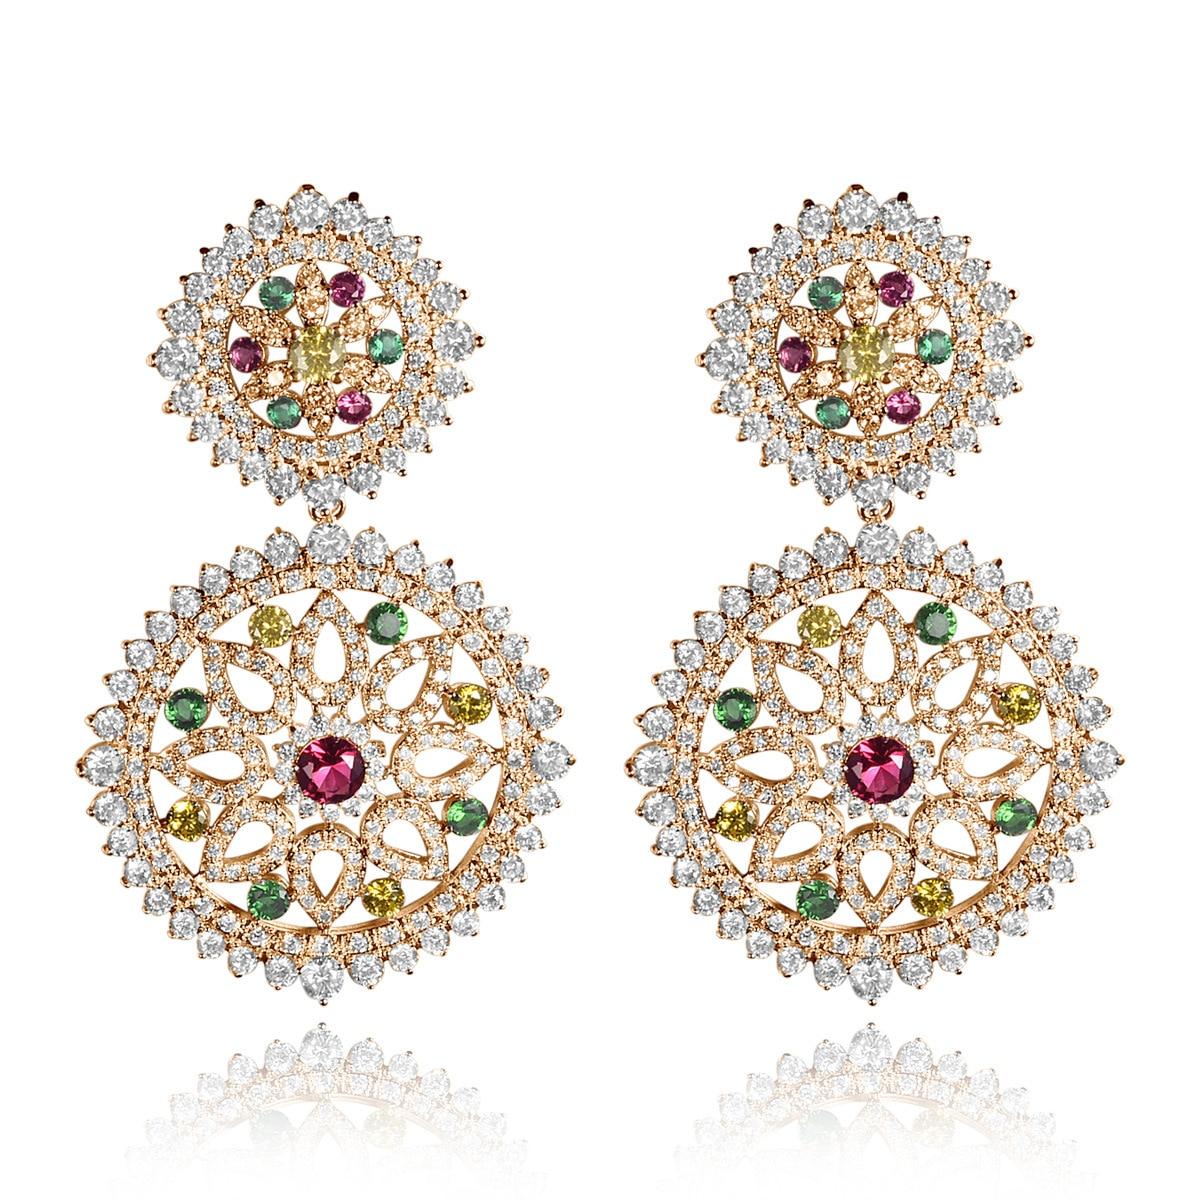 Double Round Cubic Zircon Inlay Multicolor CZ Stone Big Stud Wedding Earrings Fashion Women Party Jewelry